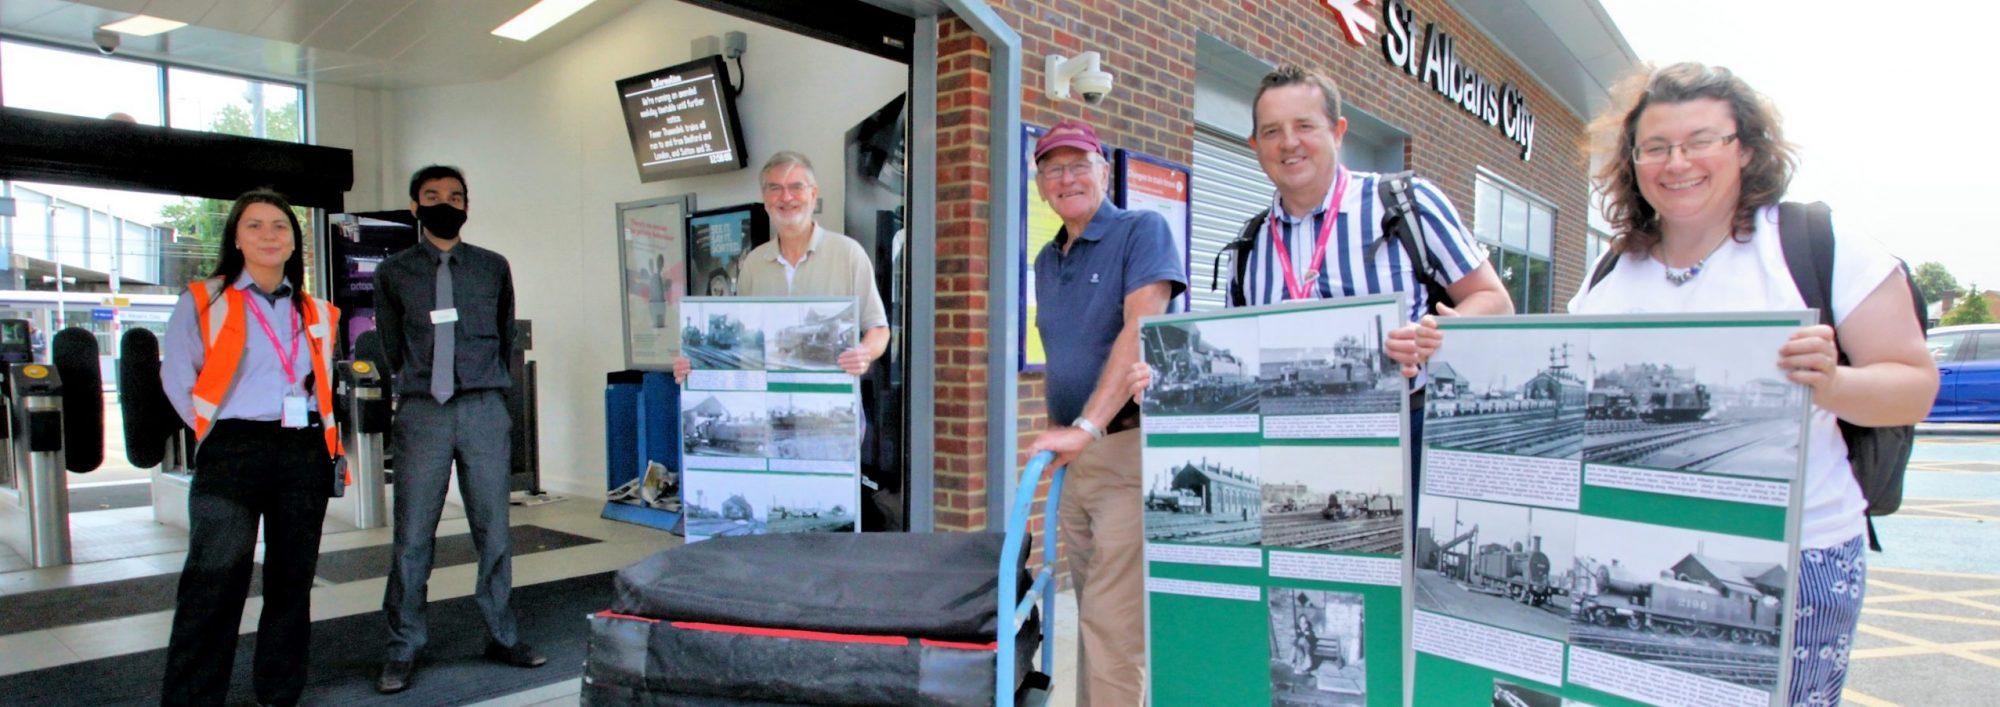 Photo exhibition now arriving on platform 4